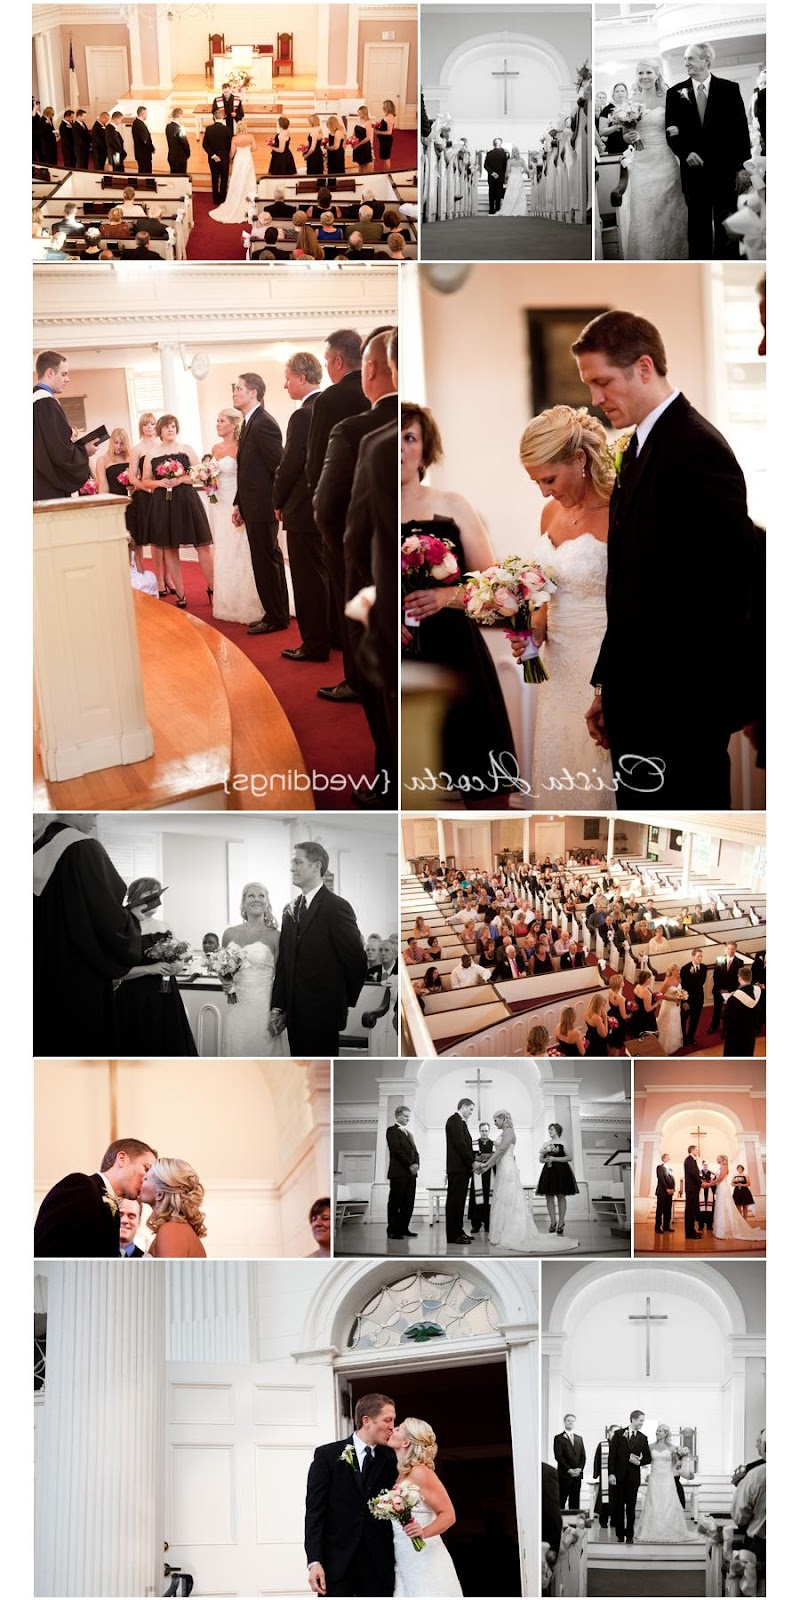 Lori and Steven   CT Wedding